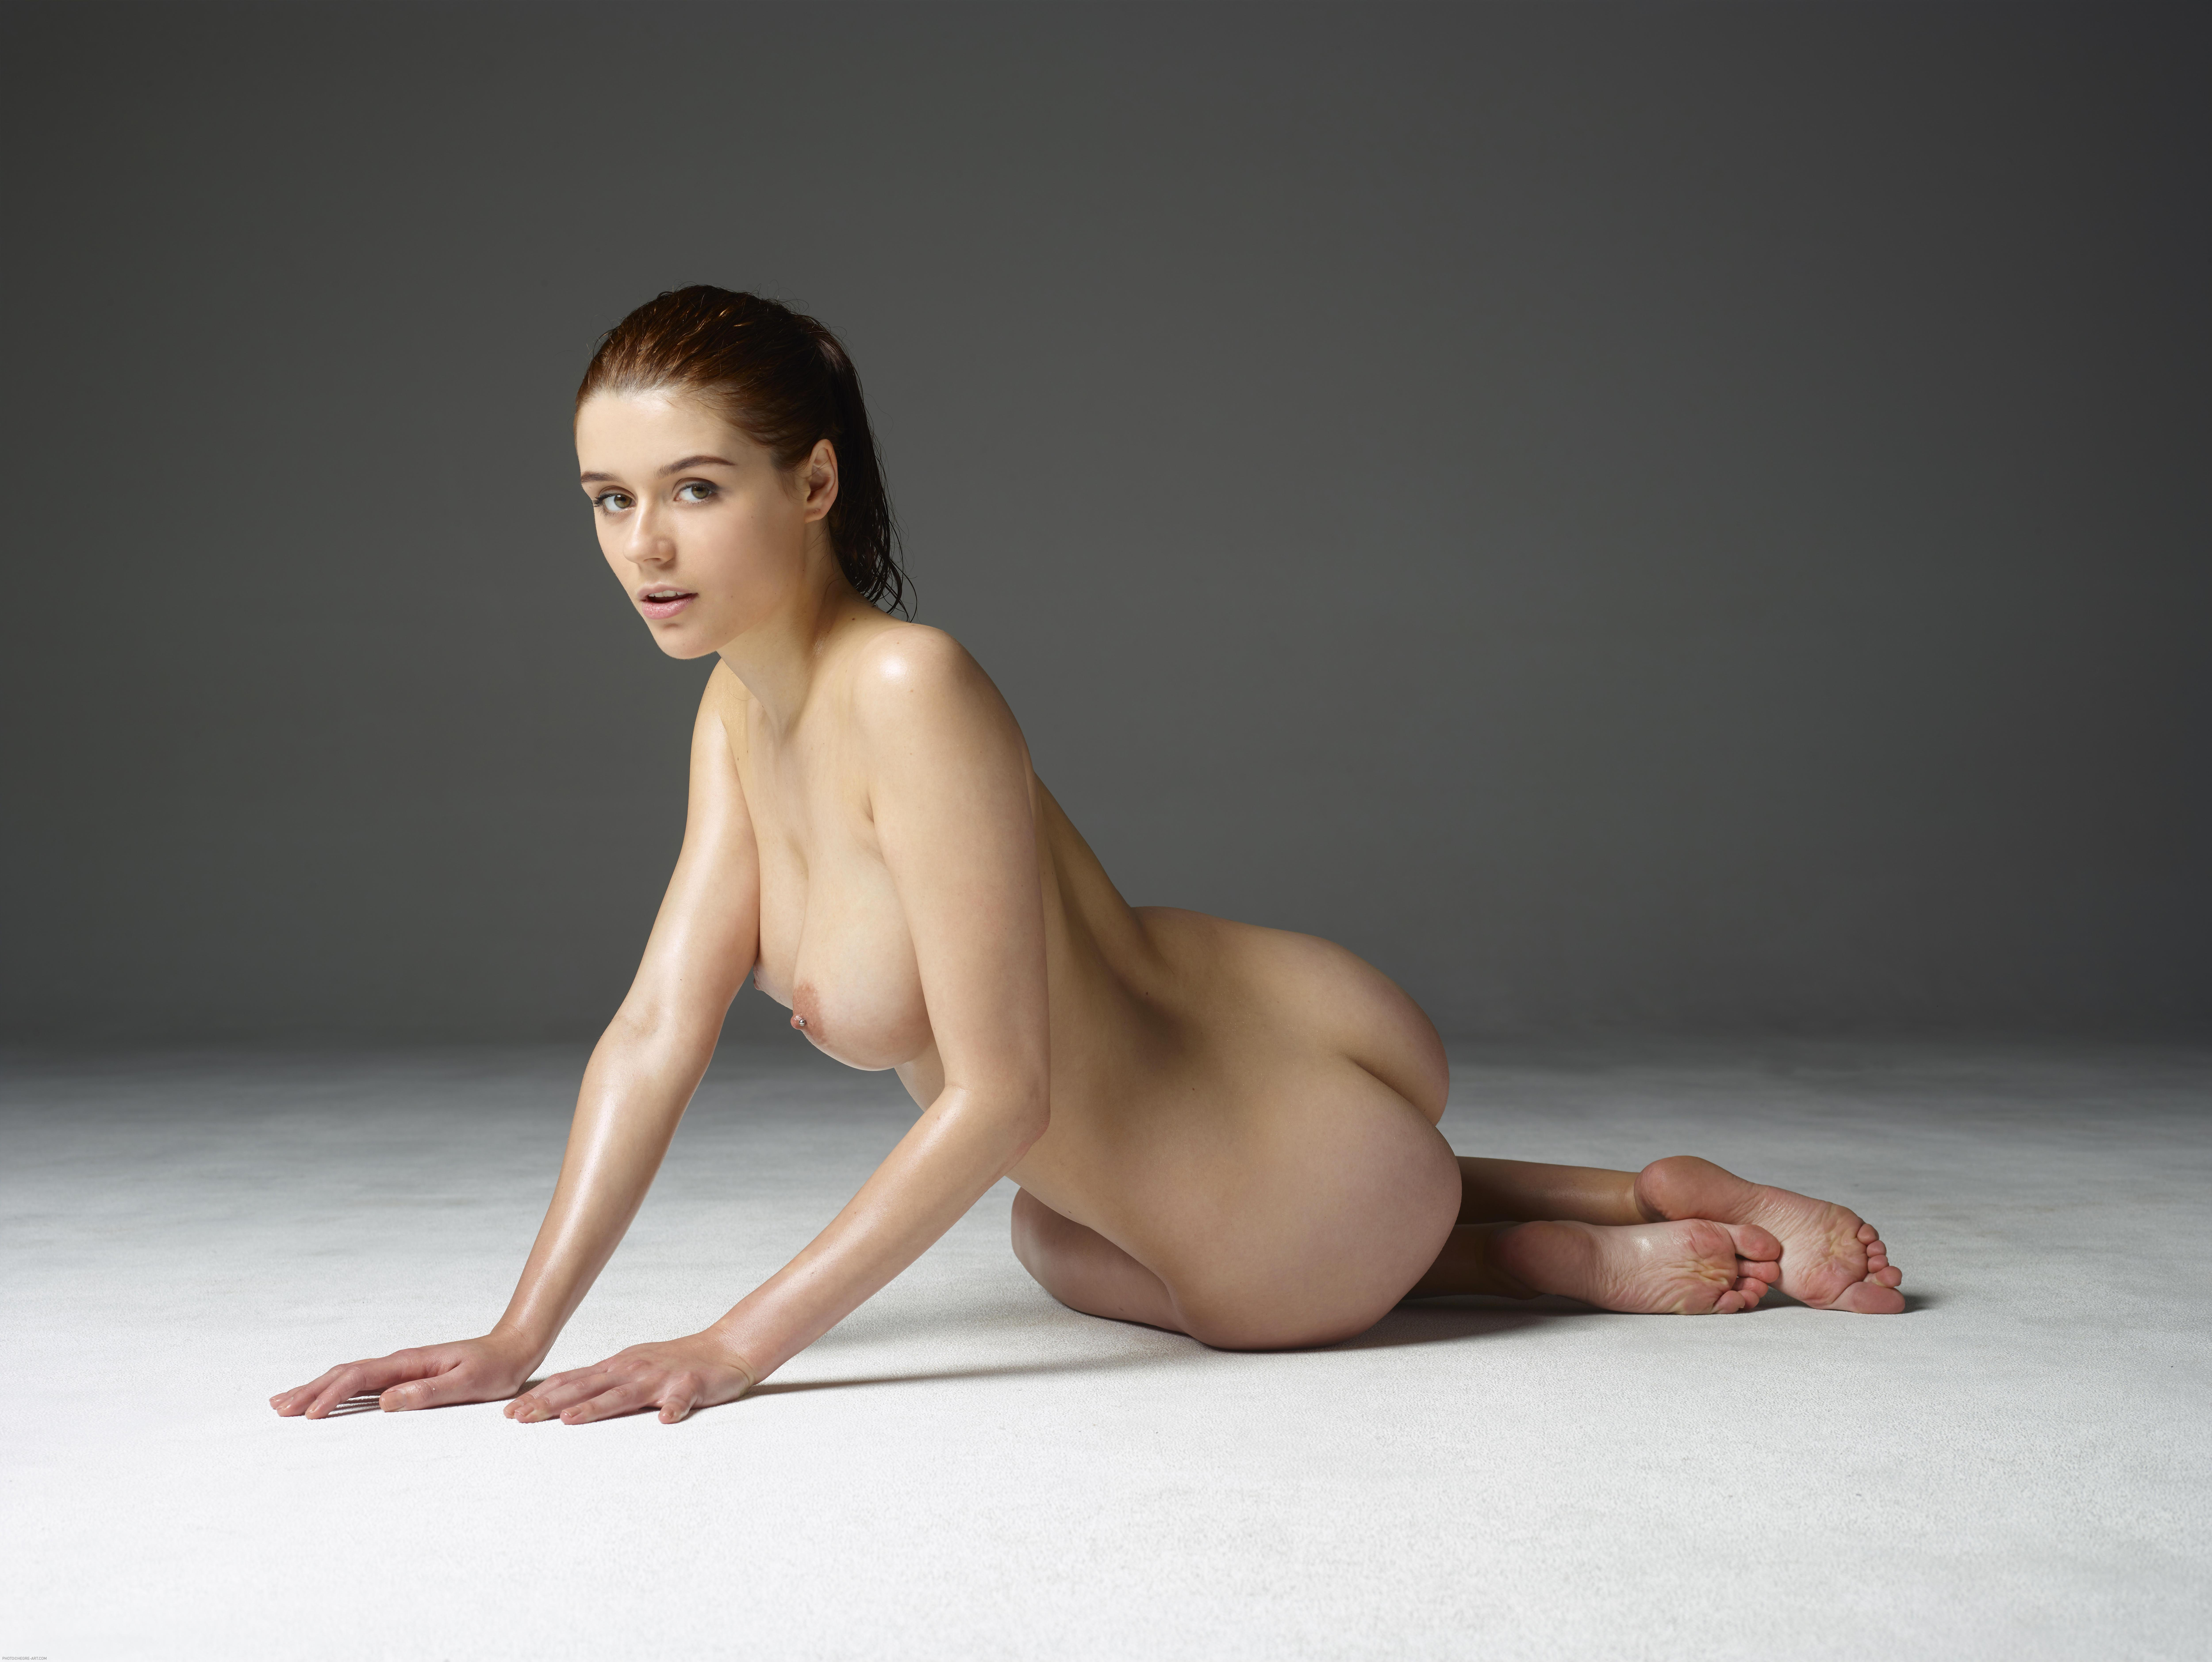 malay cute naked fucking girl